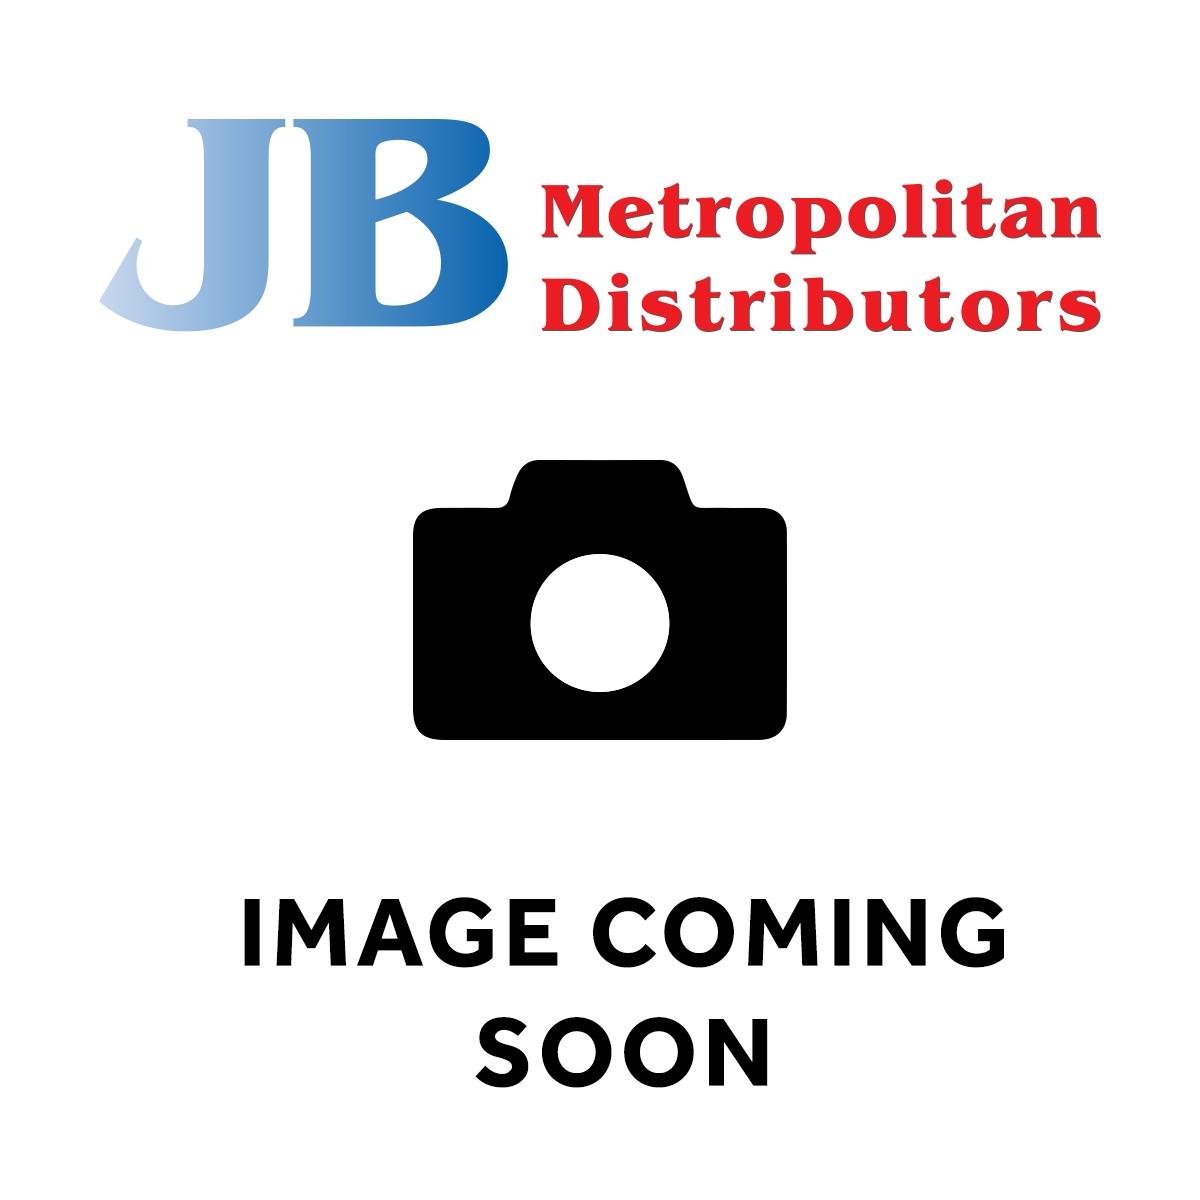 140G MALTESERS BAGS